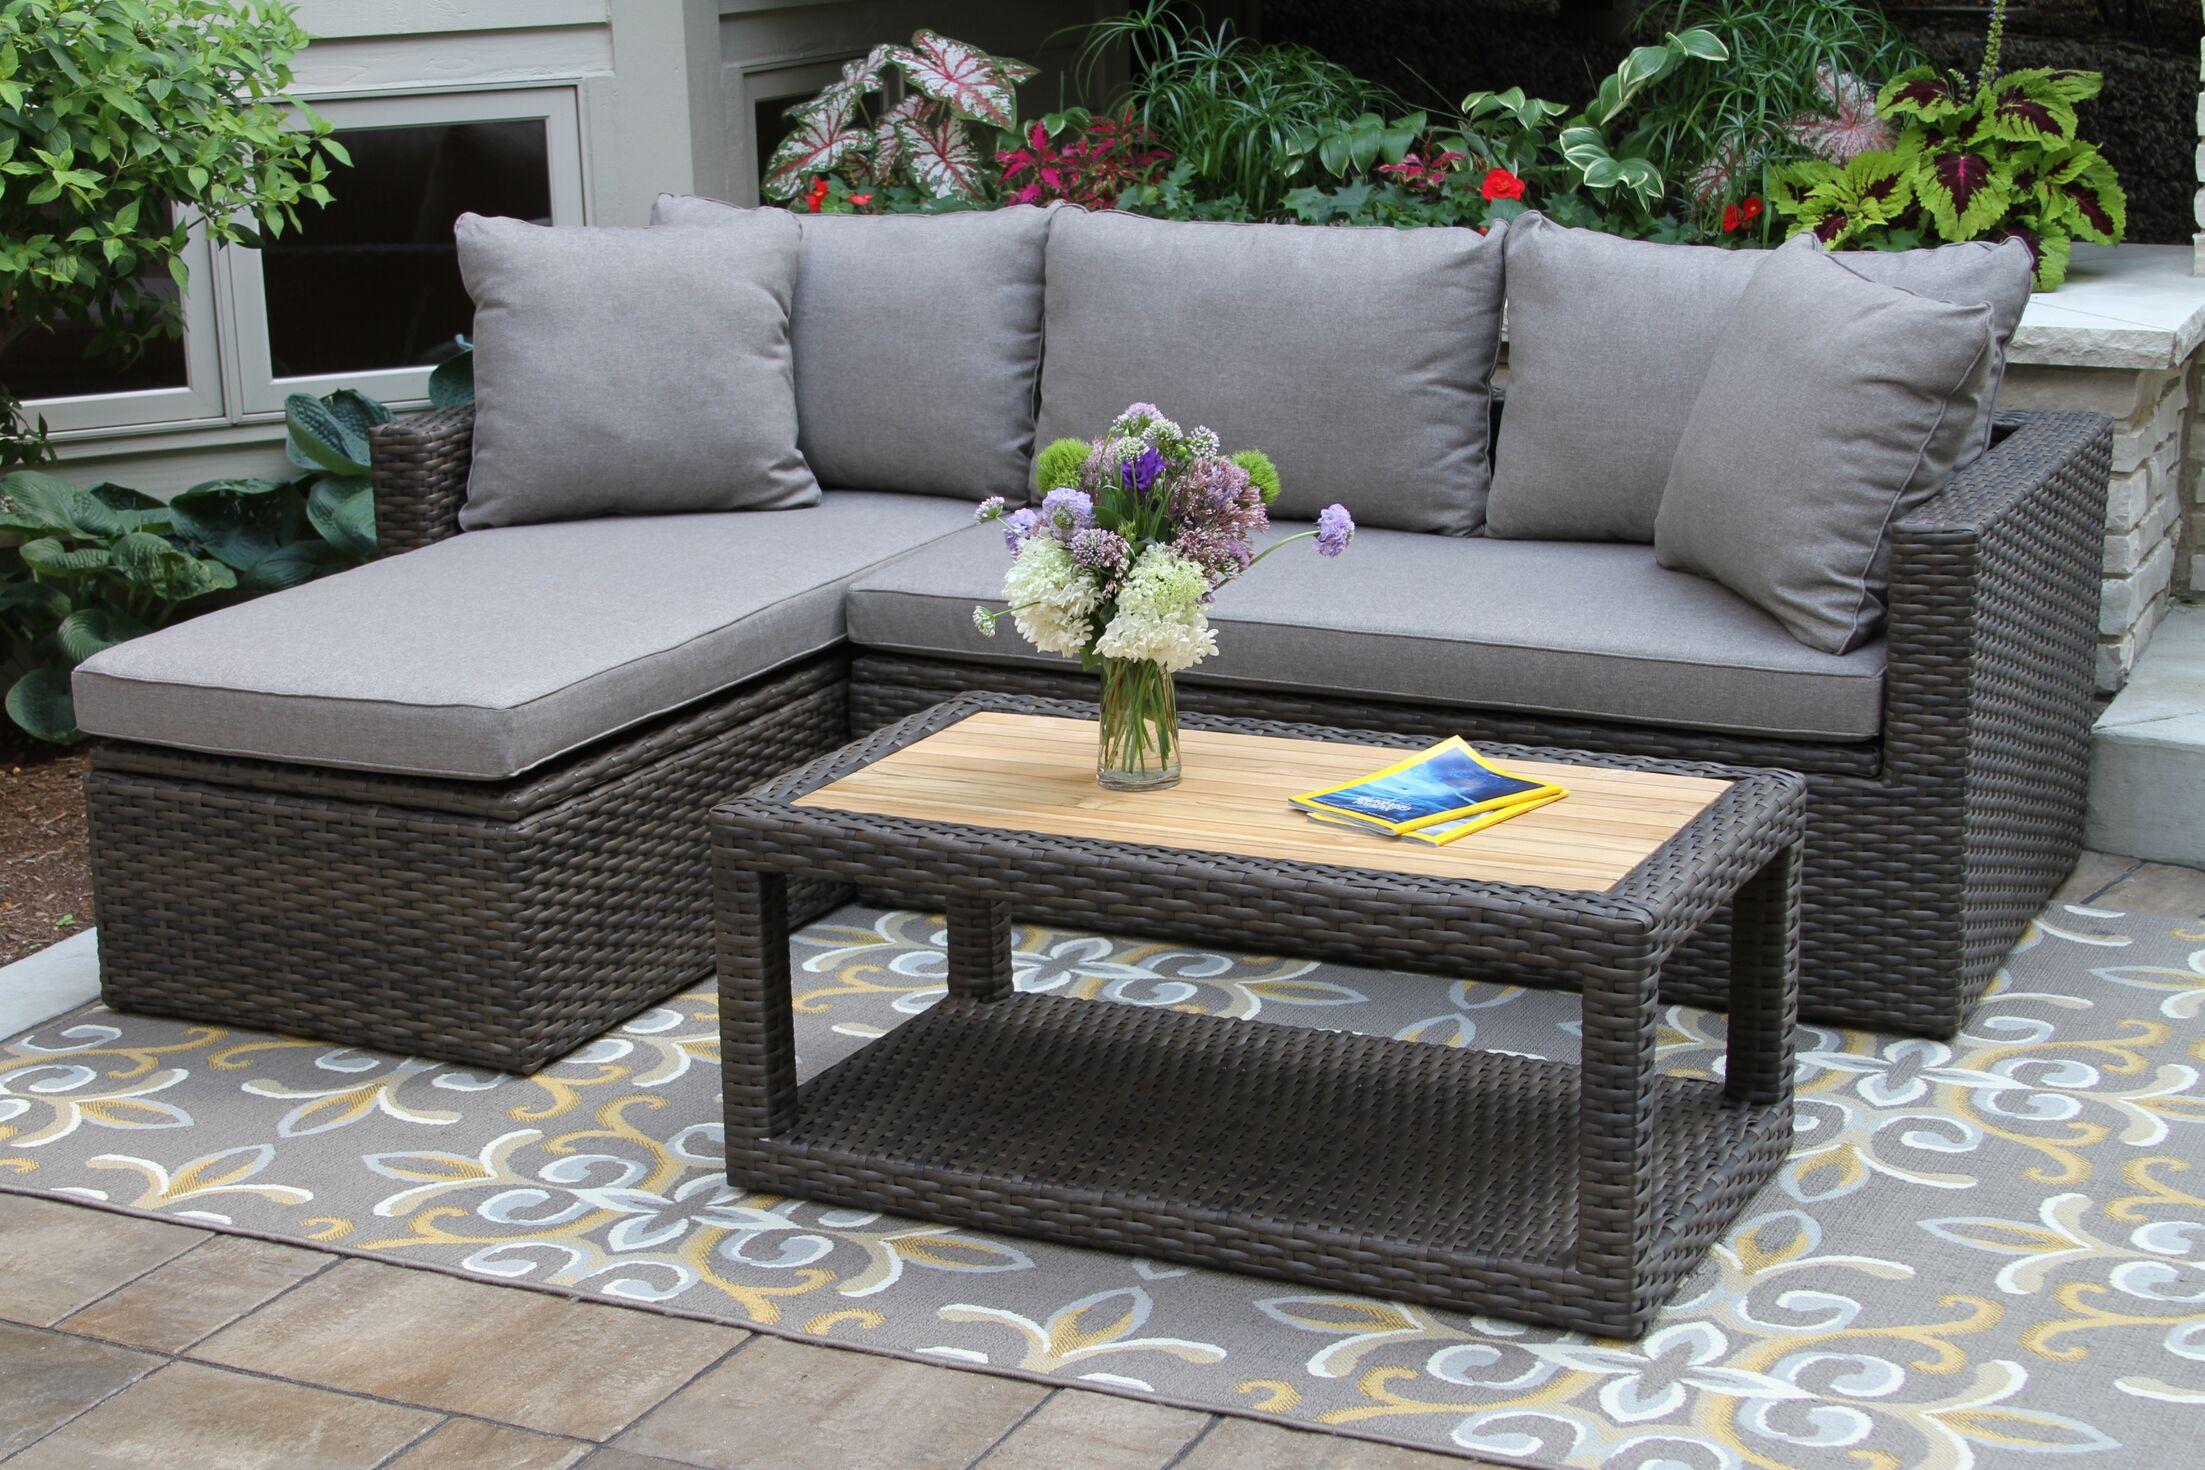 Yun 3 Piece Teak Sofa Set with Cushions